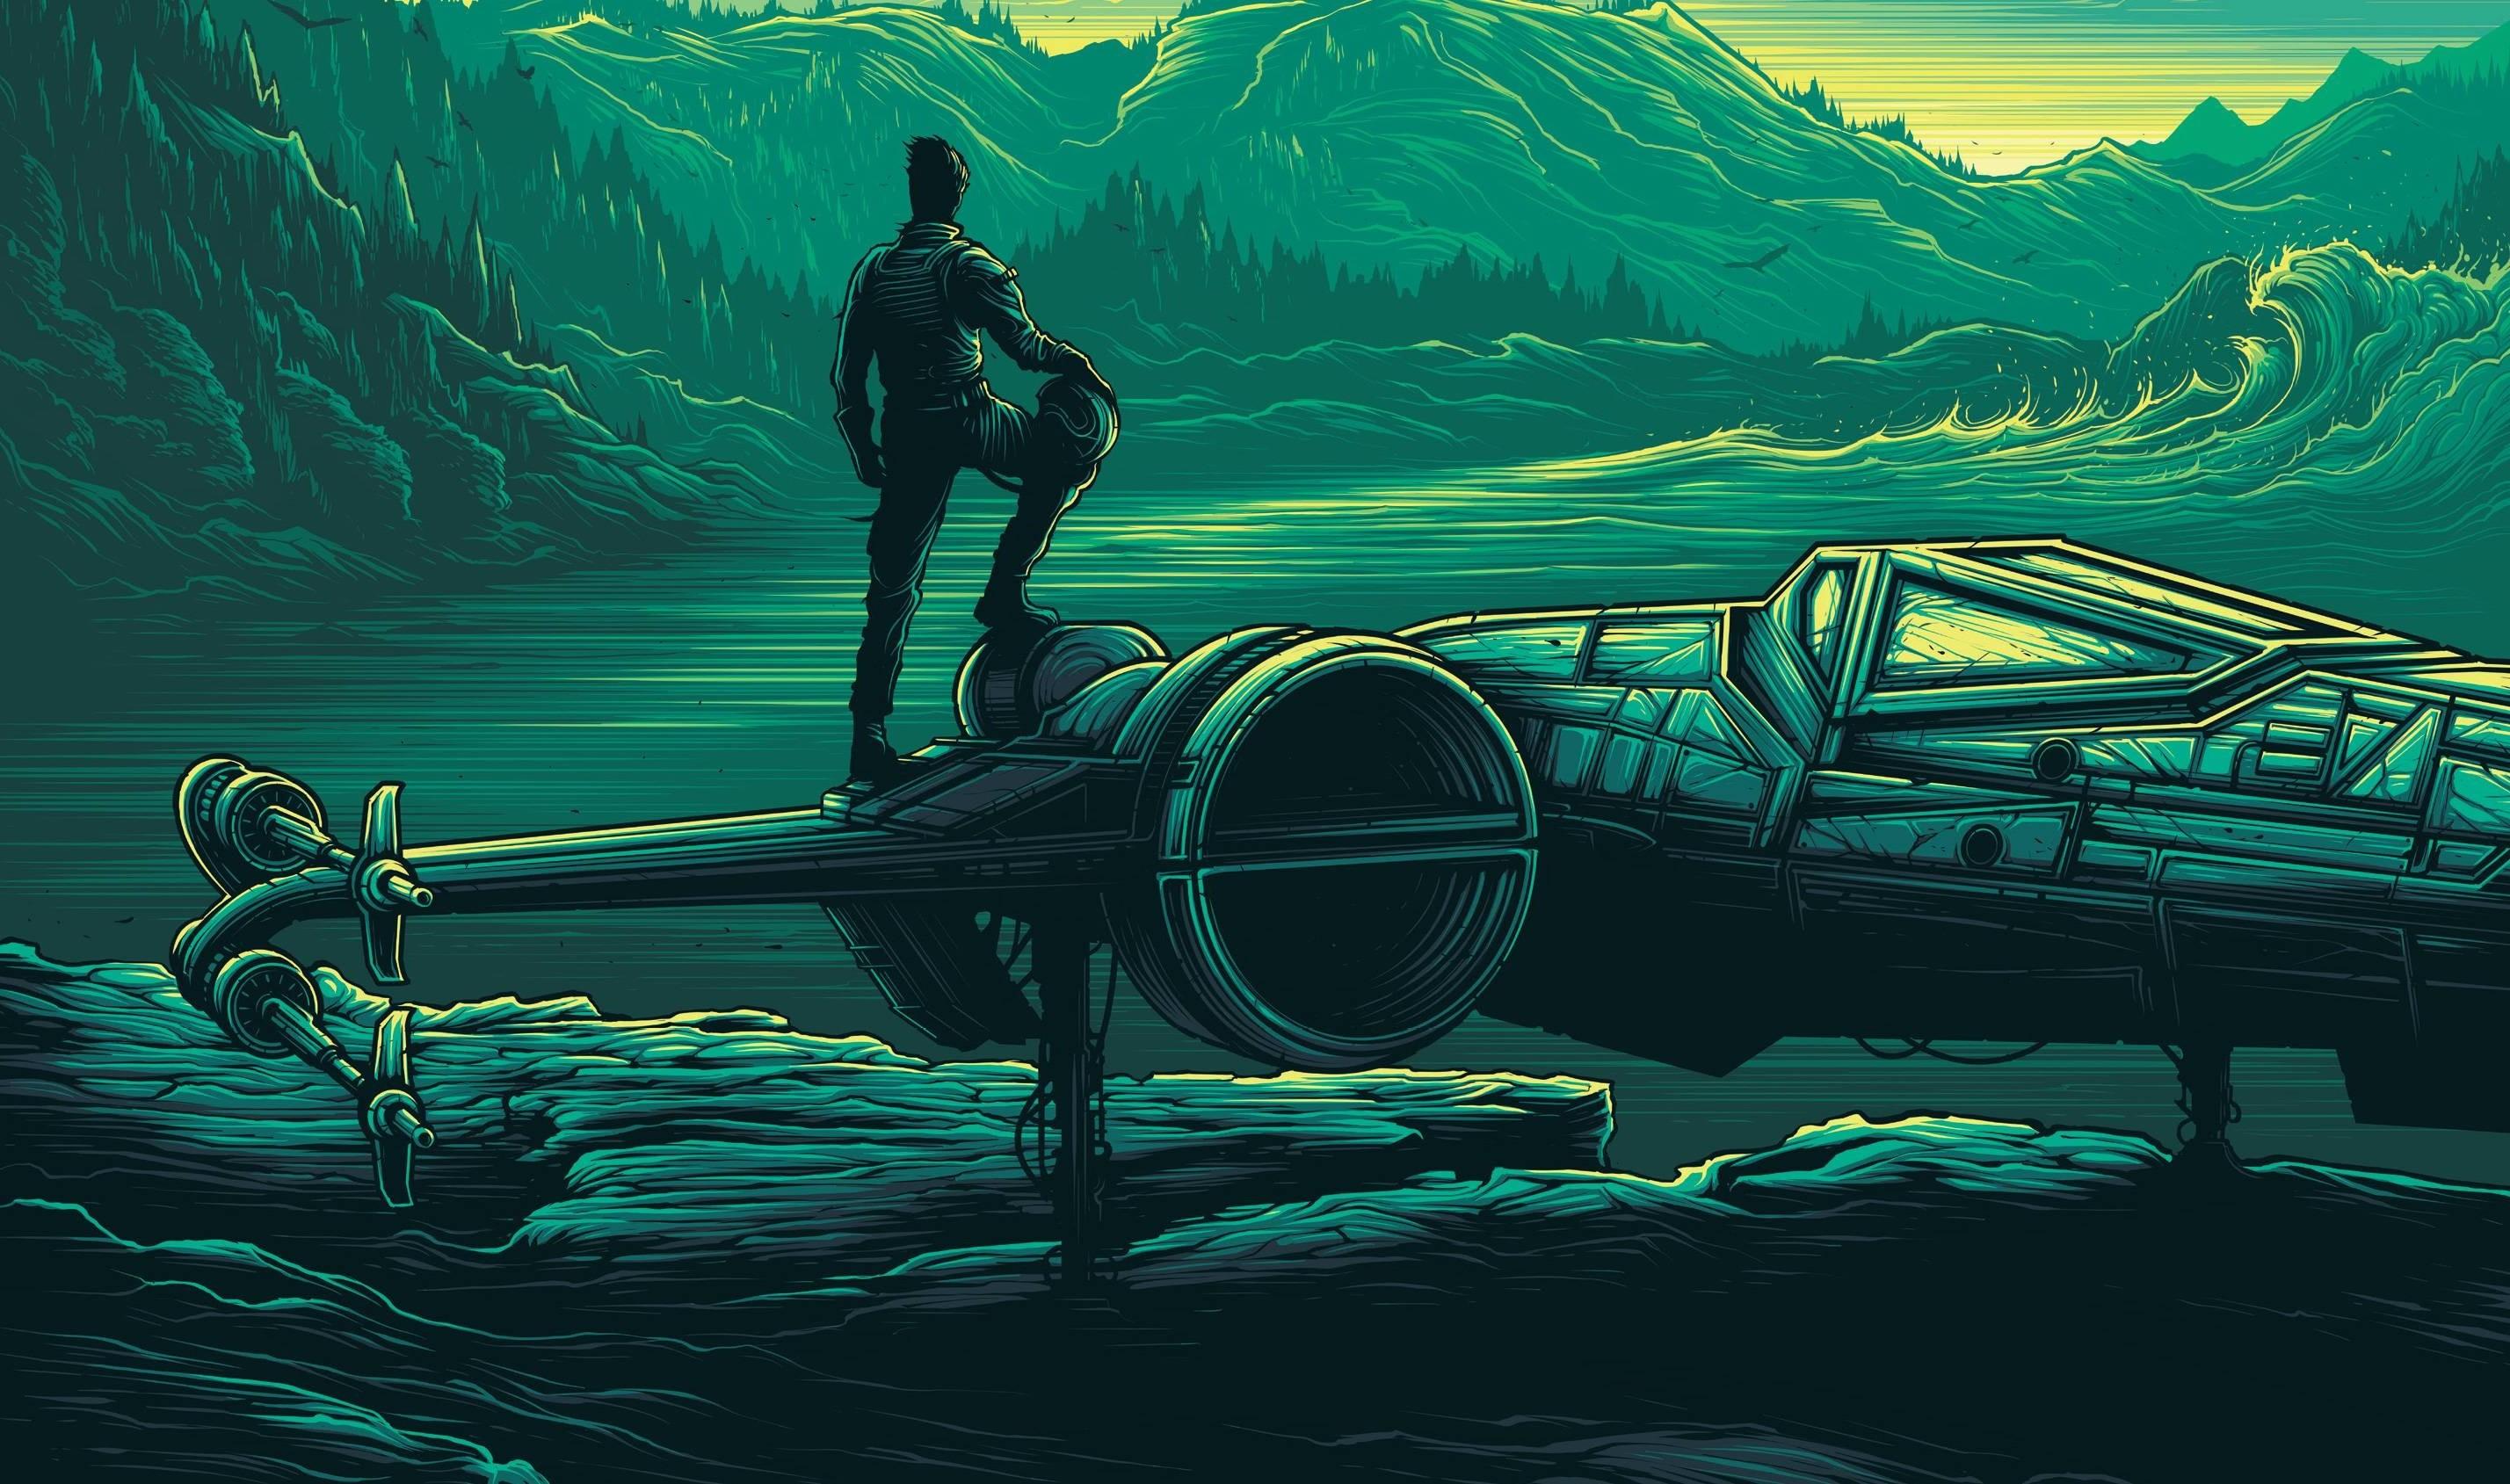 Wallpaper Forest Illustration Star Wars Vehicle Green Blue Waves Pastel Pilot X Wing Cyan Ghost Ship Mountain Screenshot Computer Wallpaper 2856x1689 Px 2856x1689 Wallhaven 633881 Hd Wallpapers Wallhere